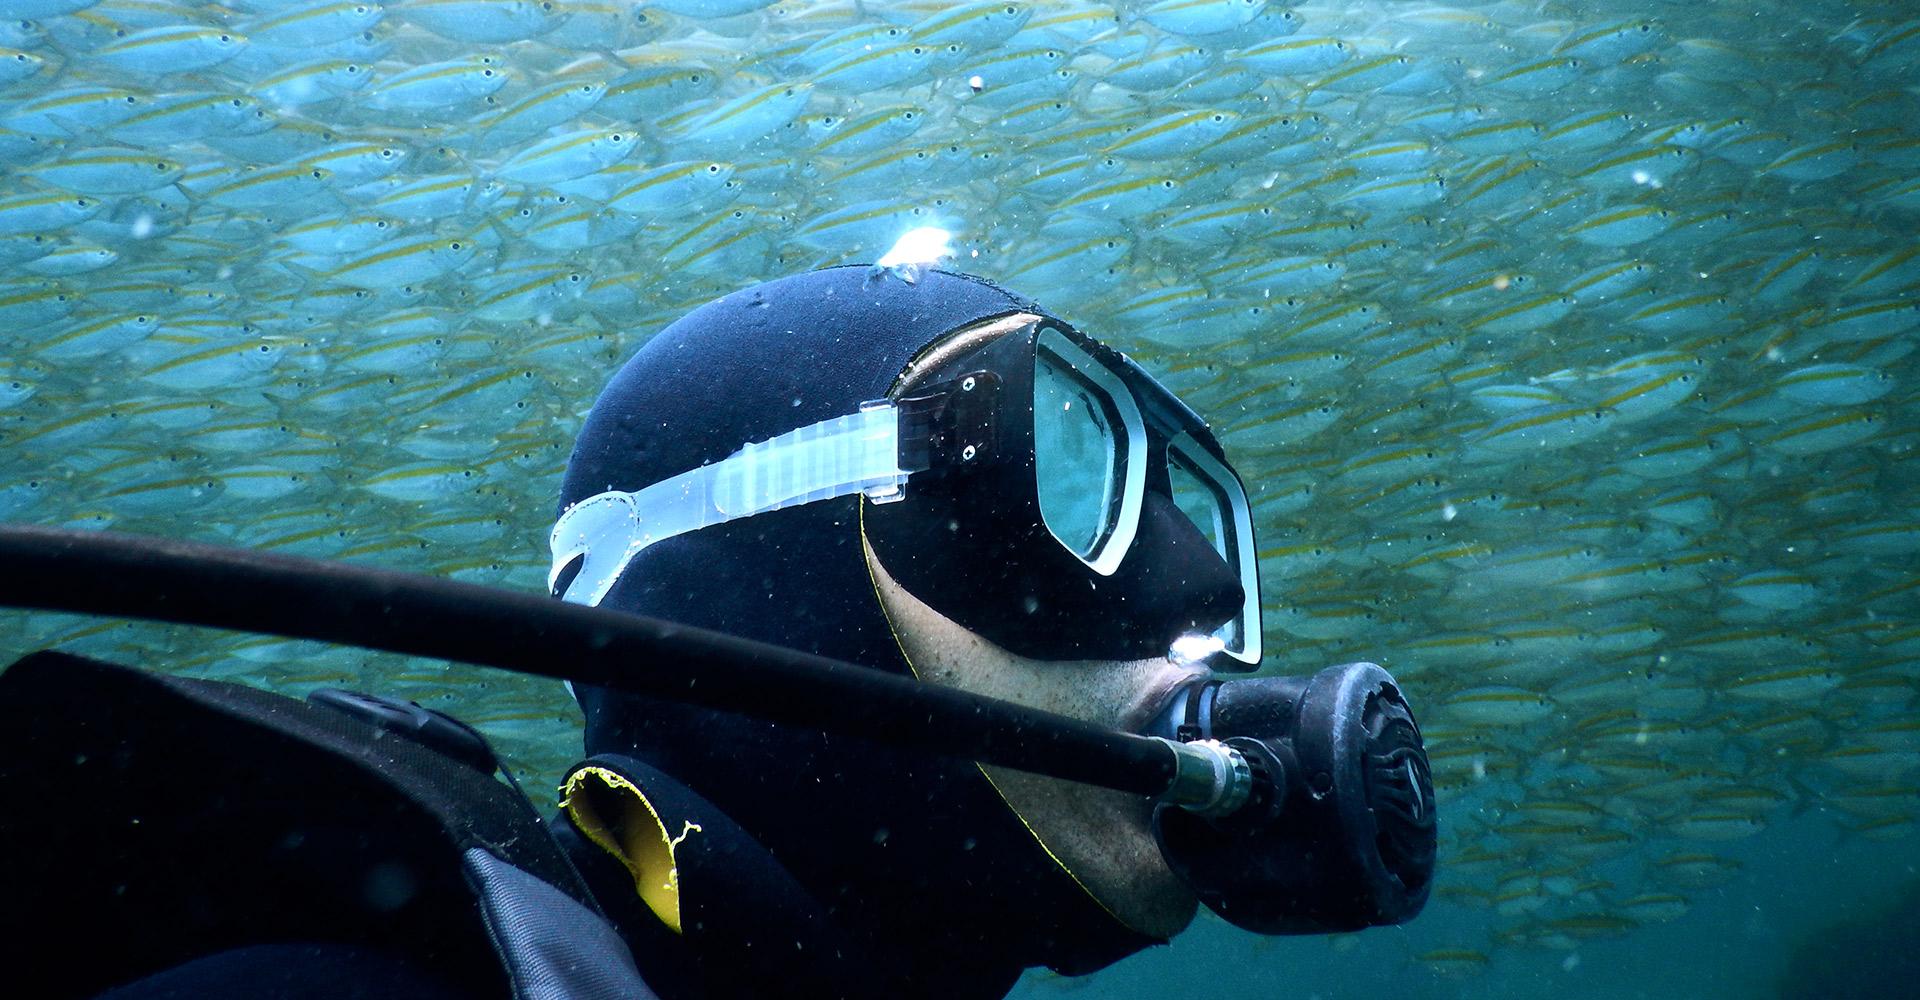 Scuba diving locations koh samui thailand silent divers - Padi dive locations ...